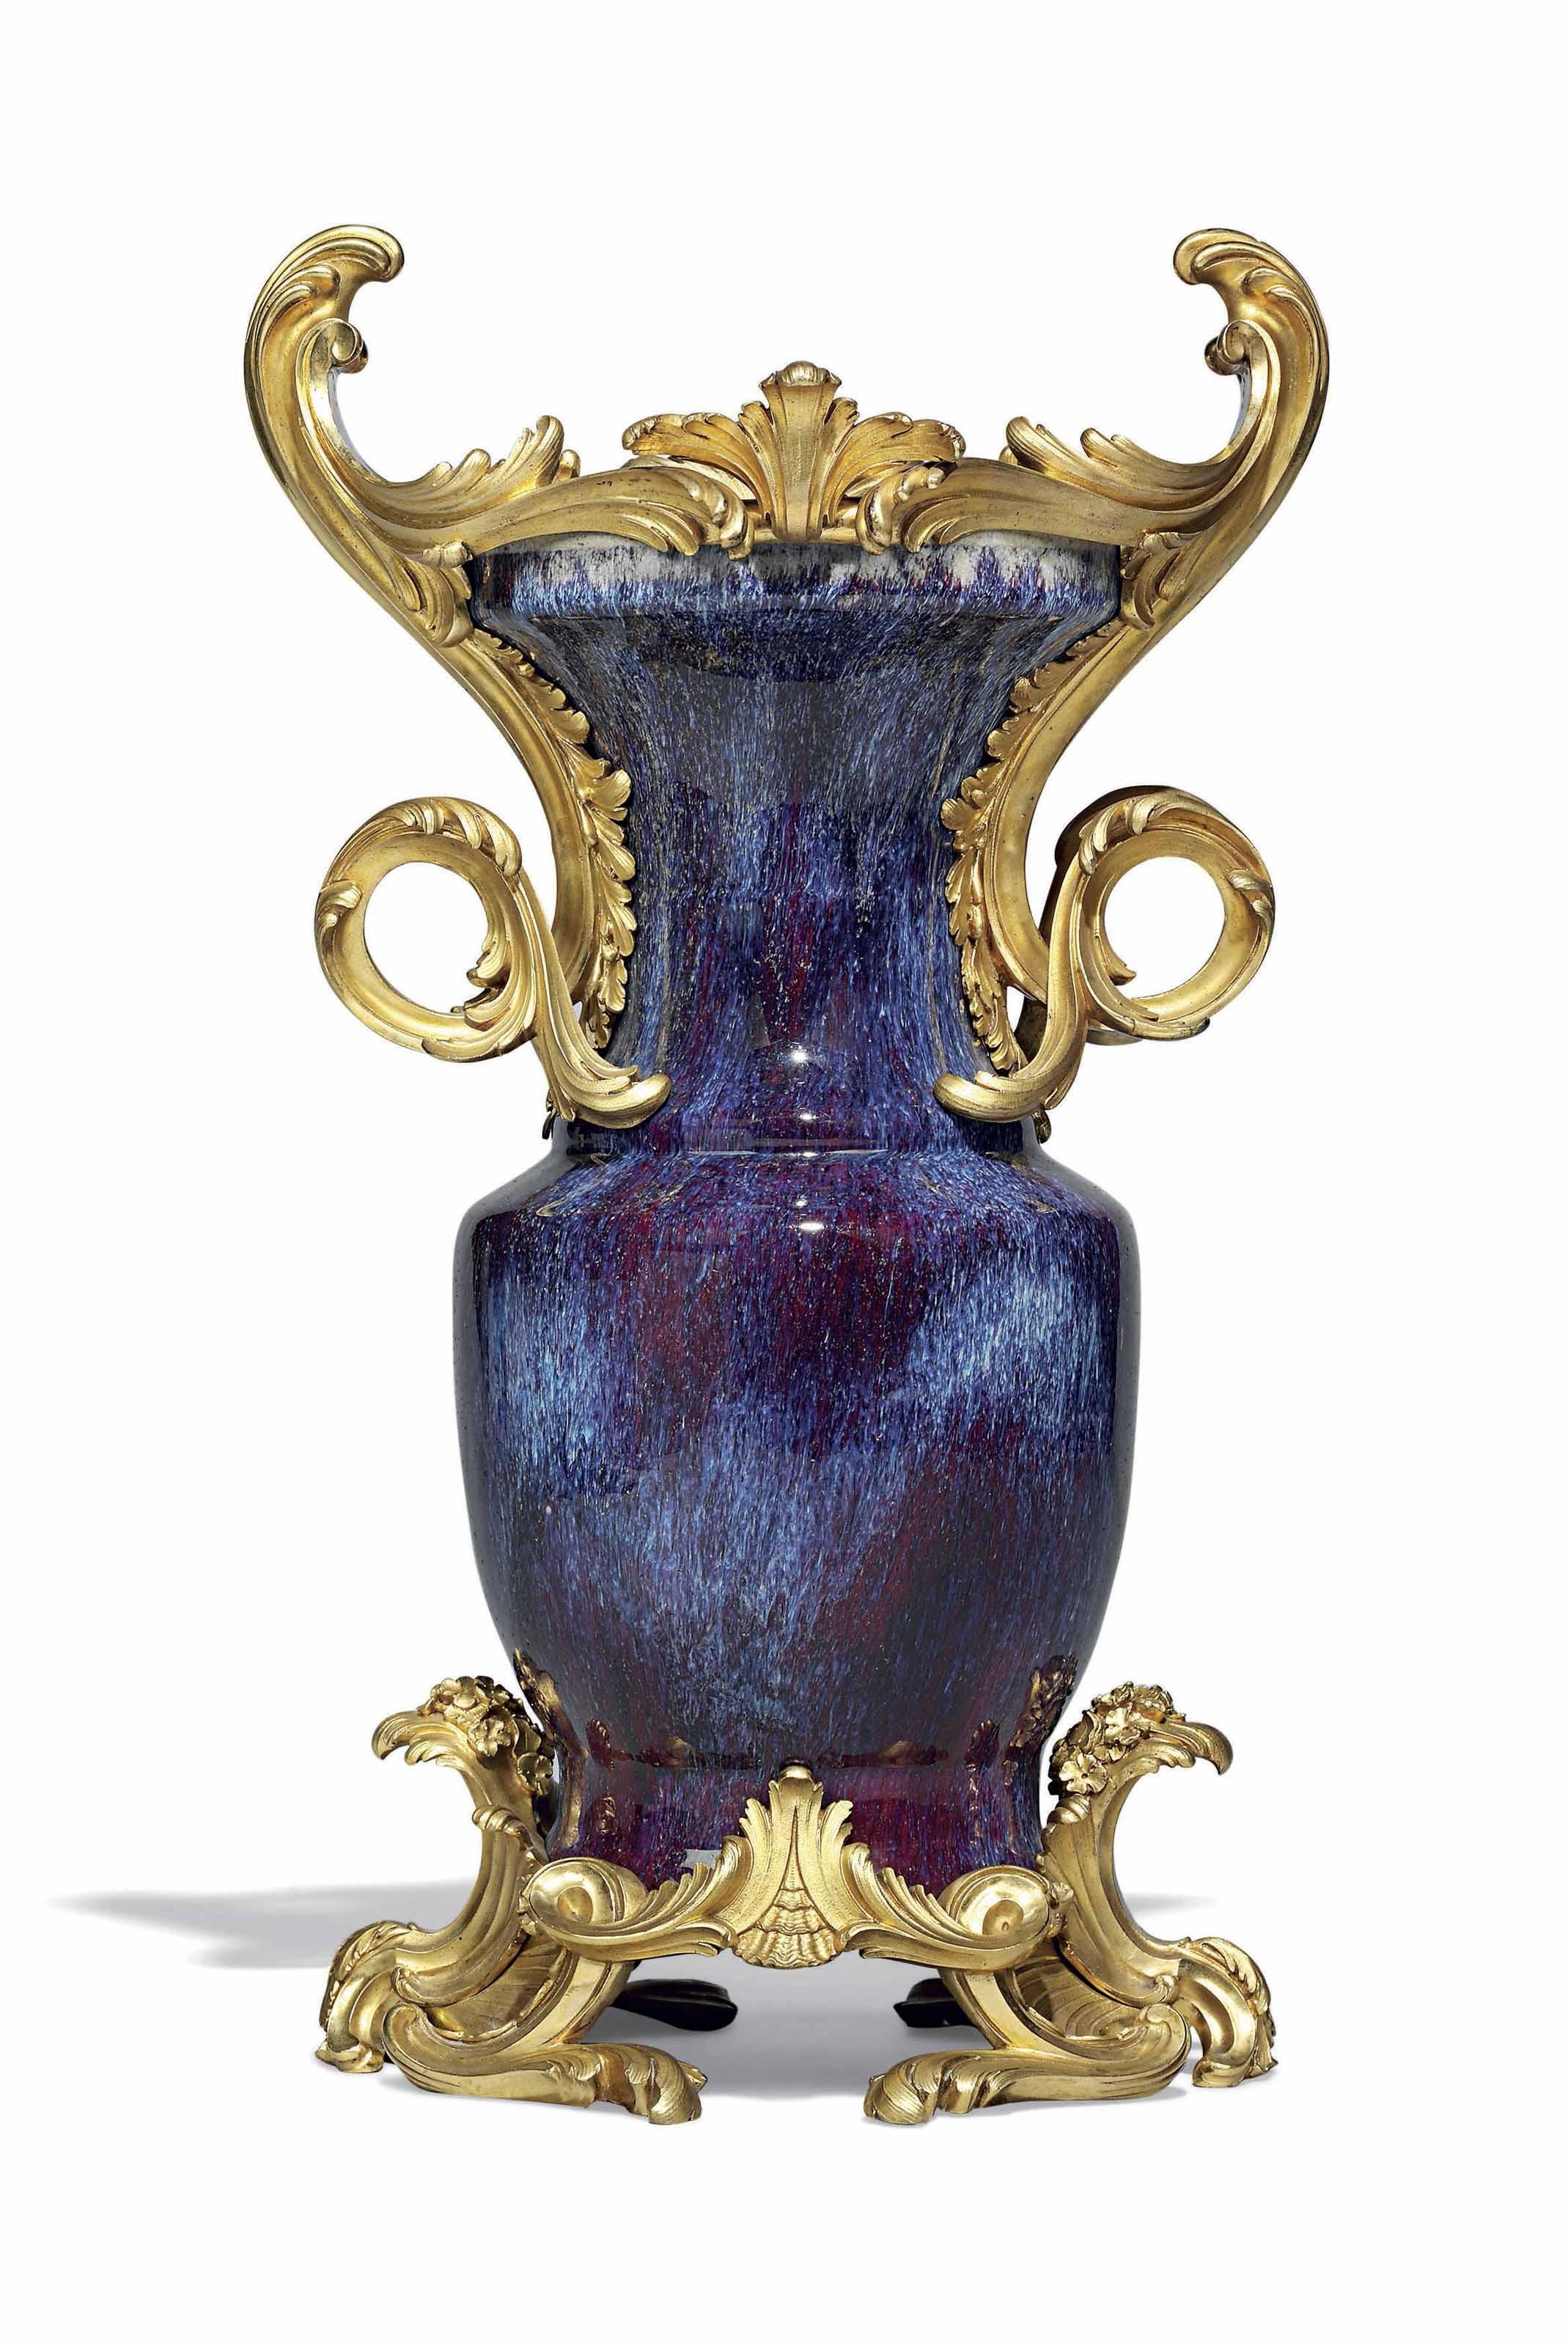 A LOUIS XV ORMOLU-MOUNTED CHINESE FLAMBE-GLAZED PORCELAIN VASE